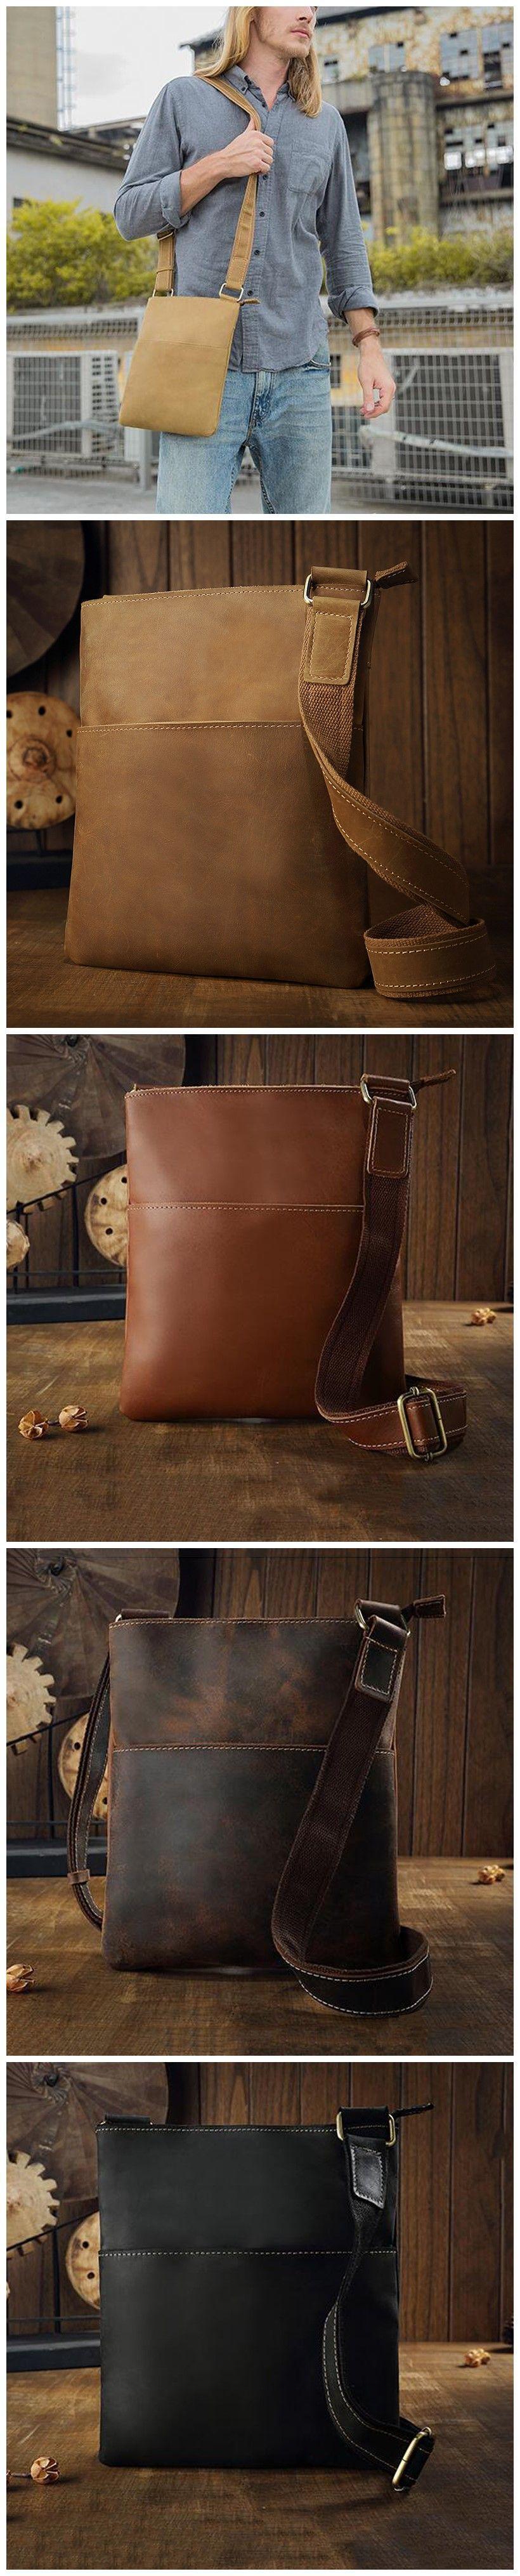 a307dde60269 6 Colors Handmade Men Men Messenger Bag Full Grain Leather Shoulder ...